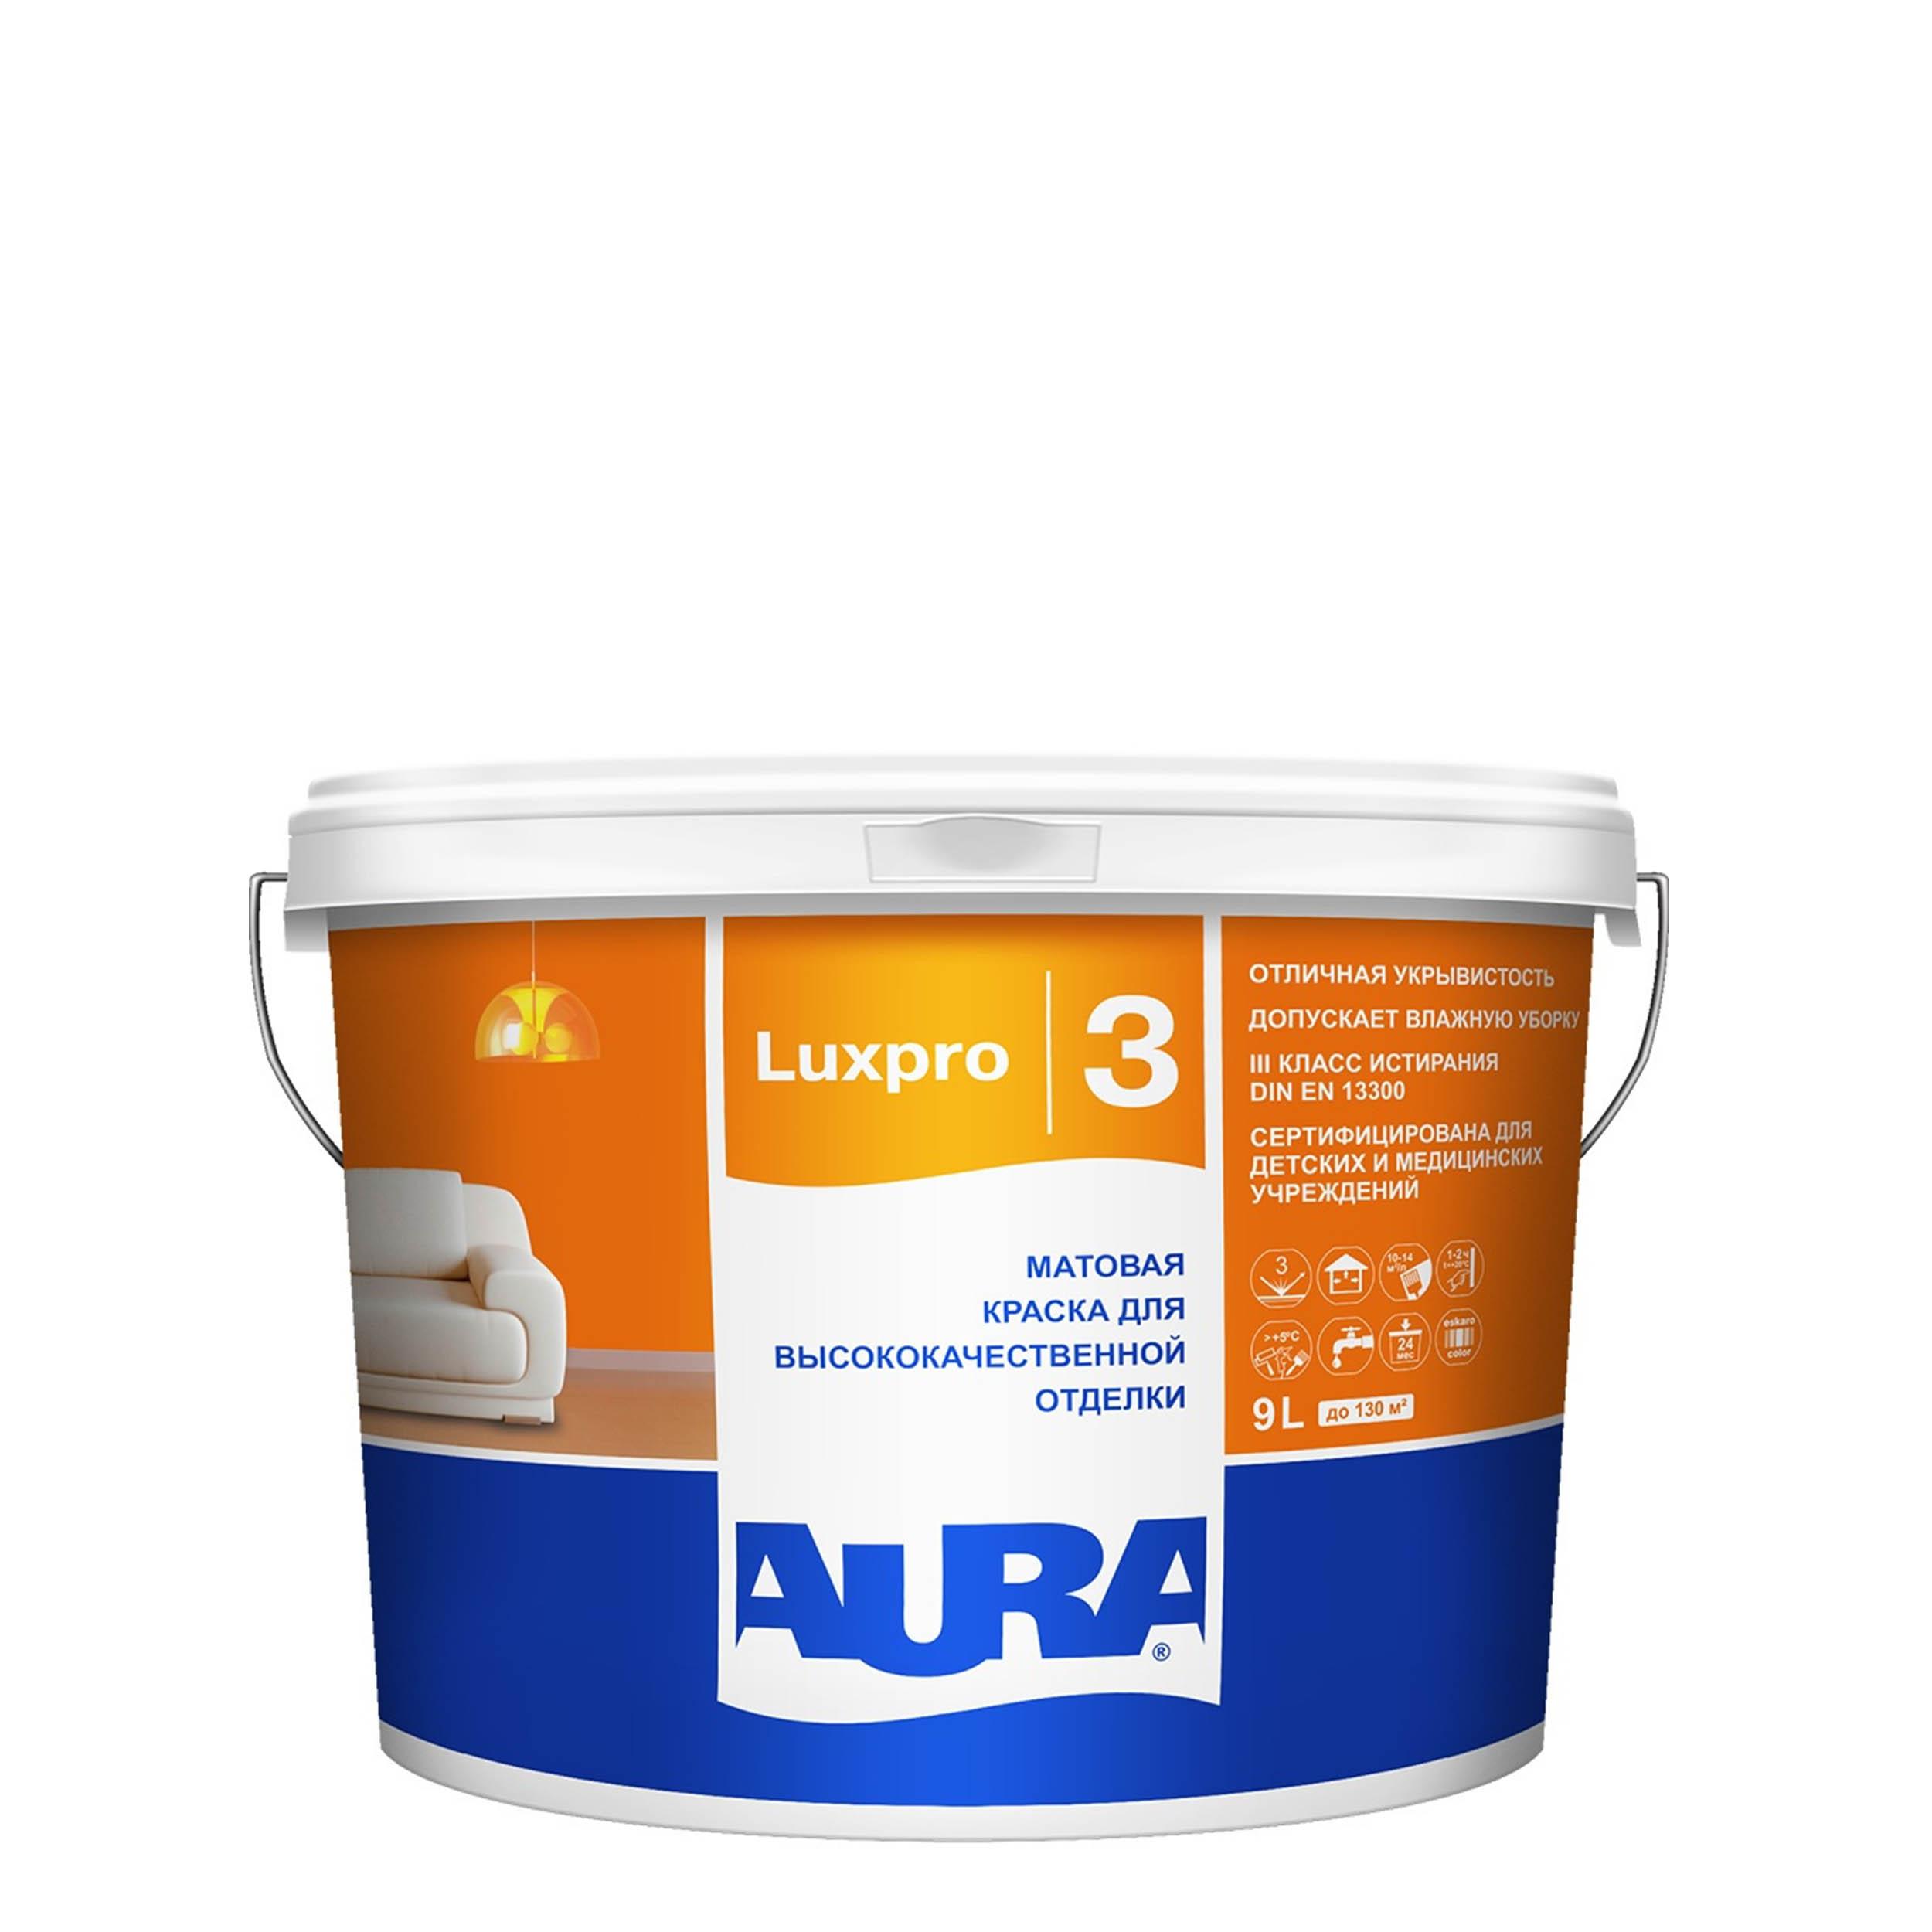 Фото 4 - Краска интерьерная, Aura LuxPRO 3, RAL 6029, 11 кг.